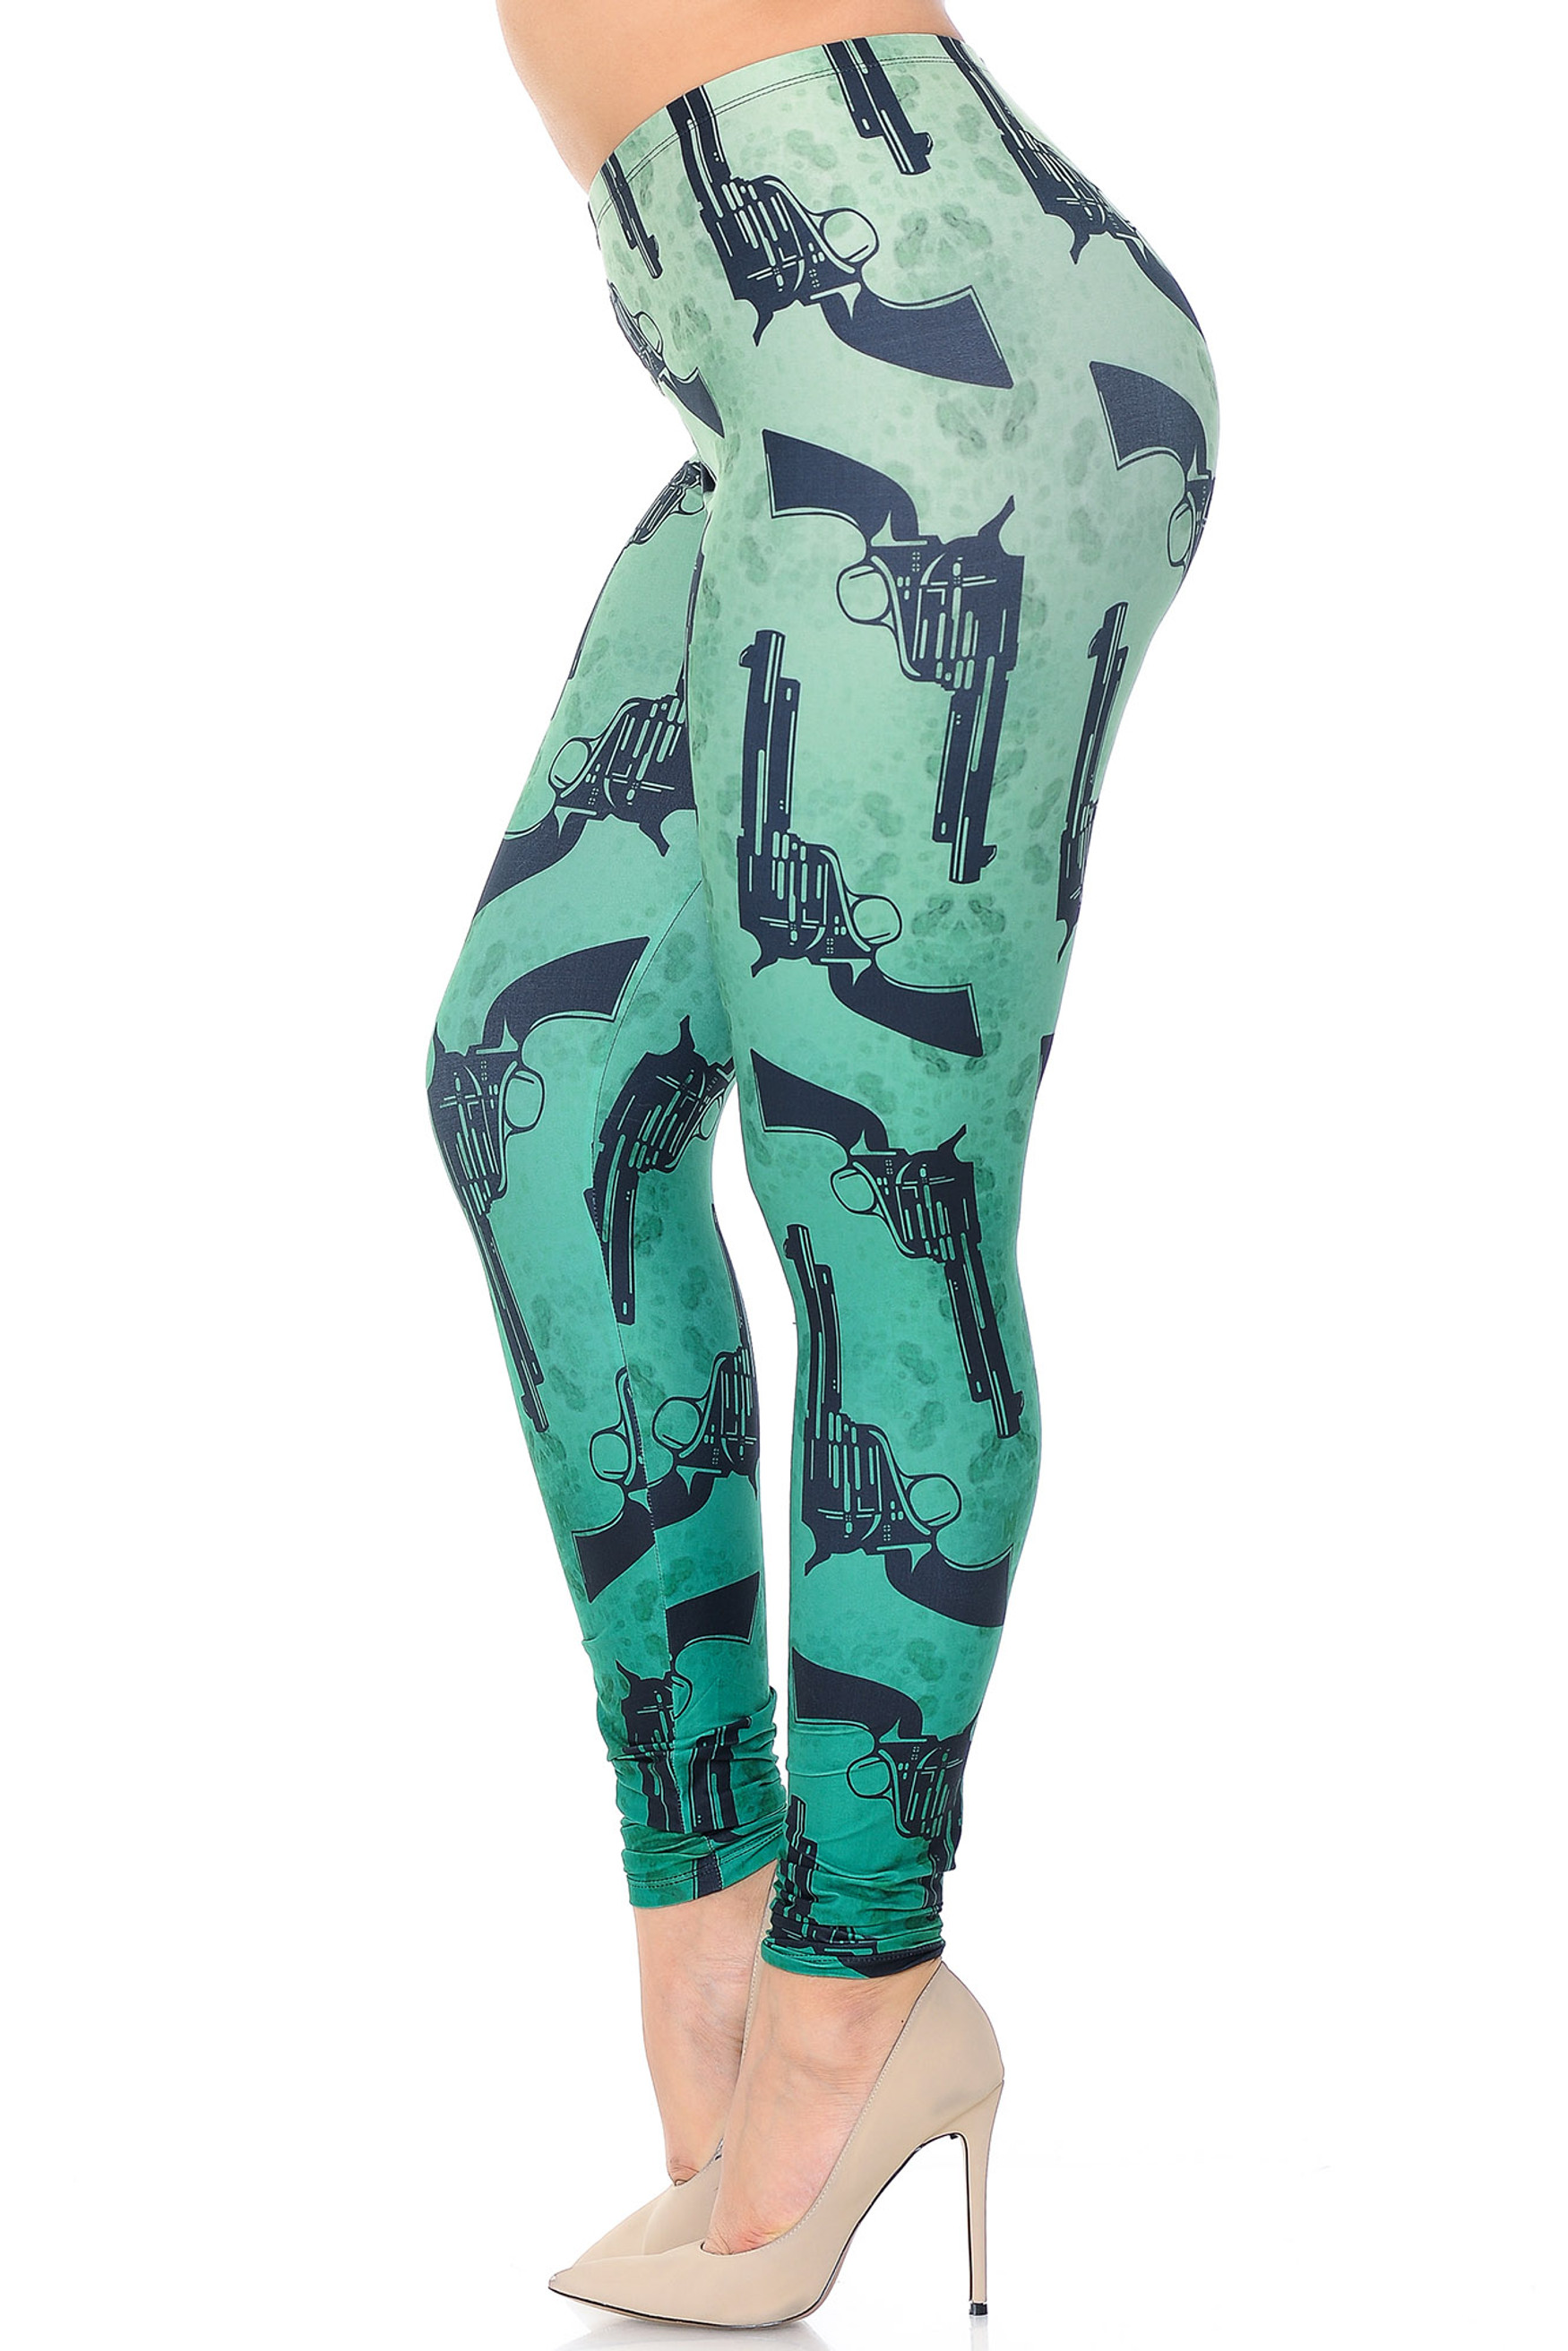 Creamy Soft Ombre Green Guns Extra Plus Size Leggings - 3X-5X